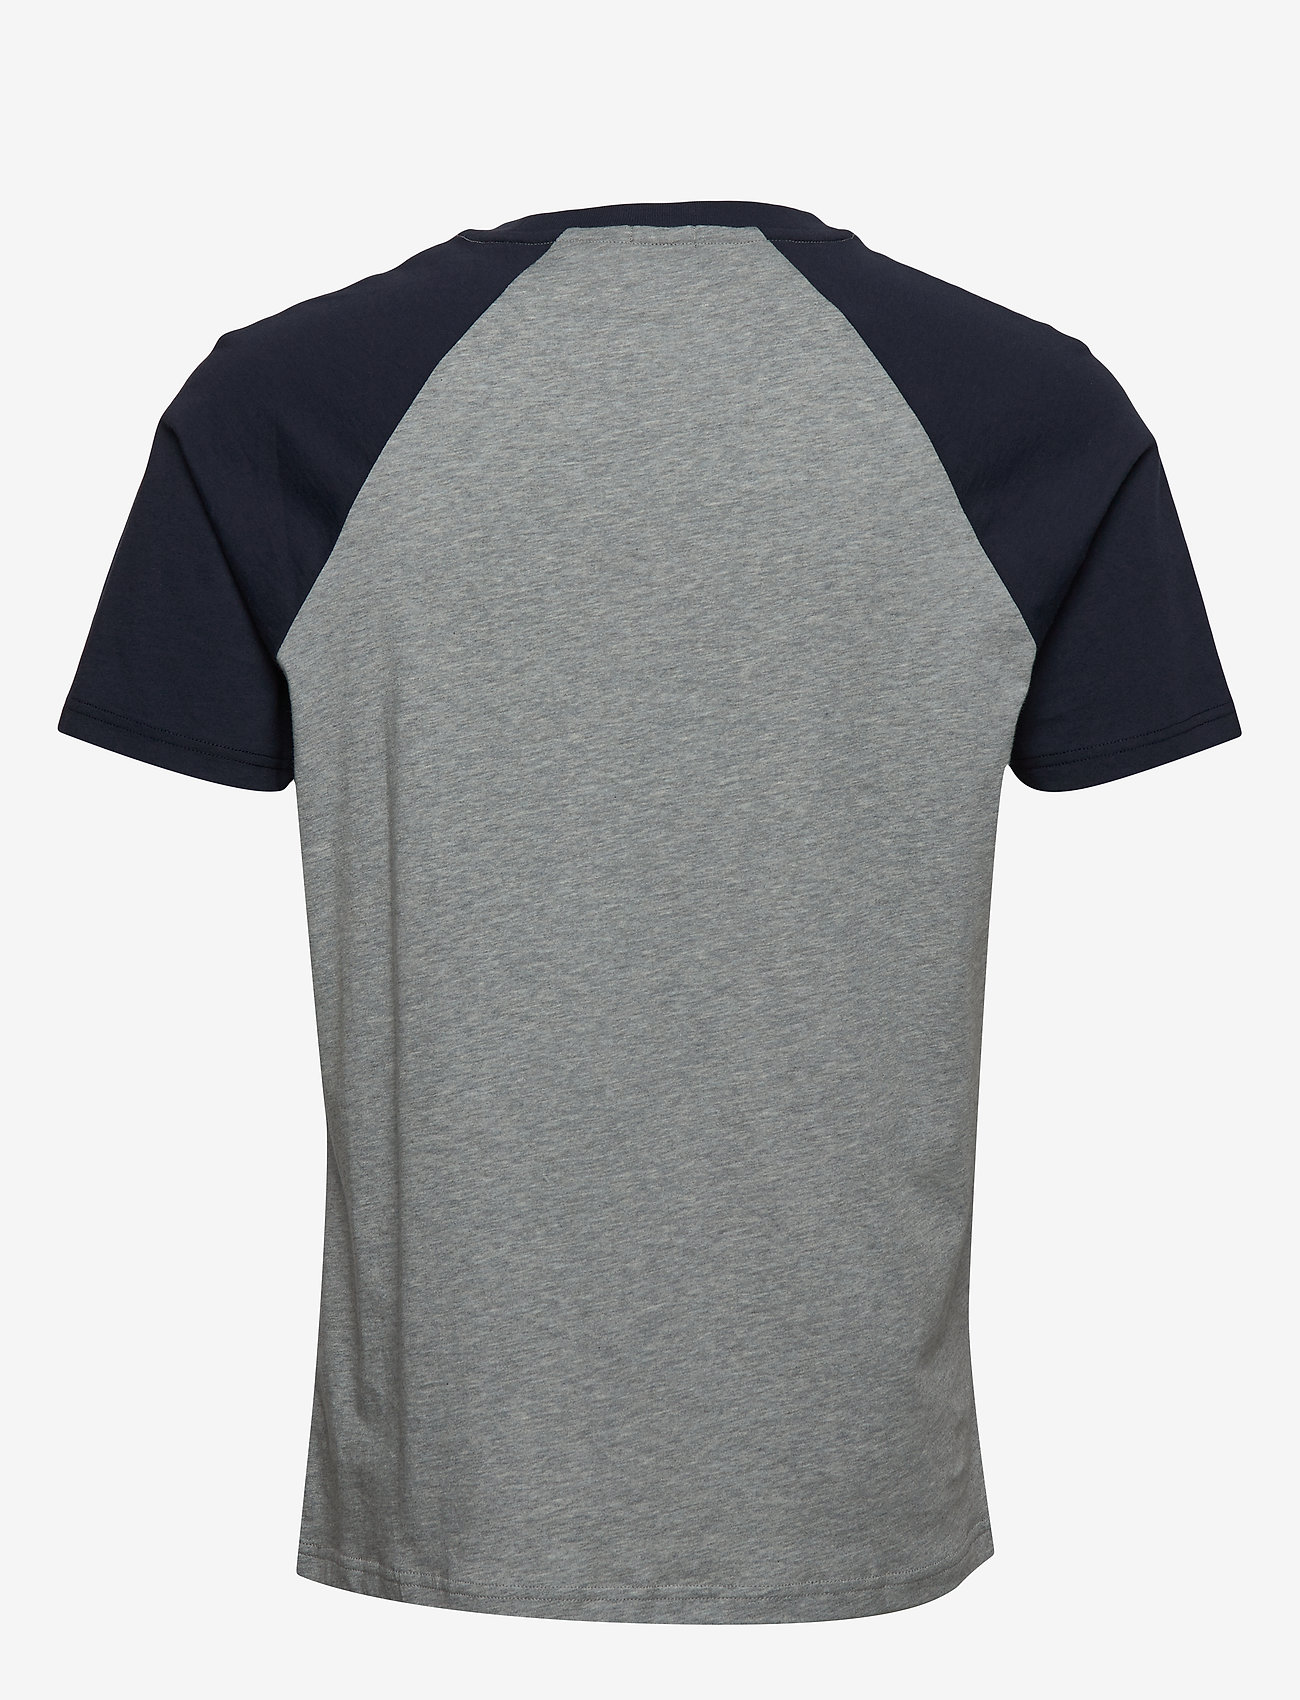 Tommy Hilfiger - CN SS TEE LOGO - kortermede t-skjorter - grey heather